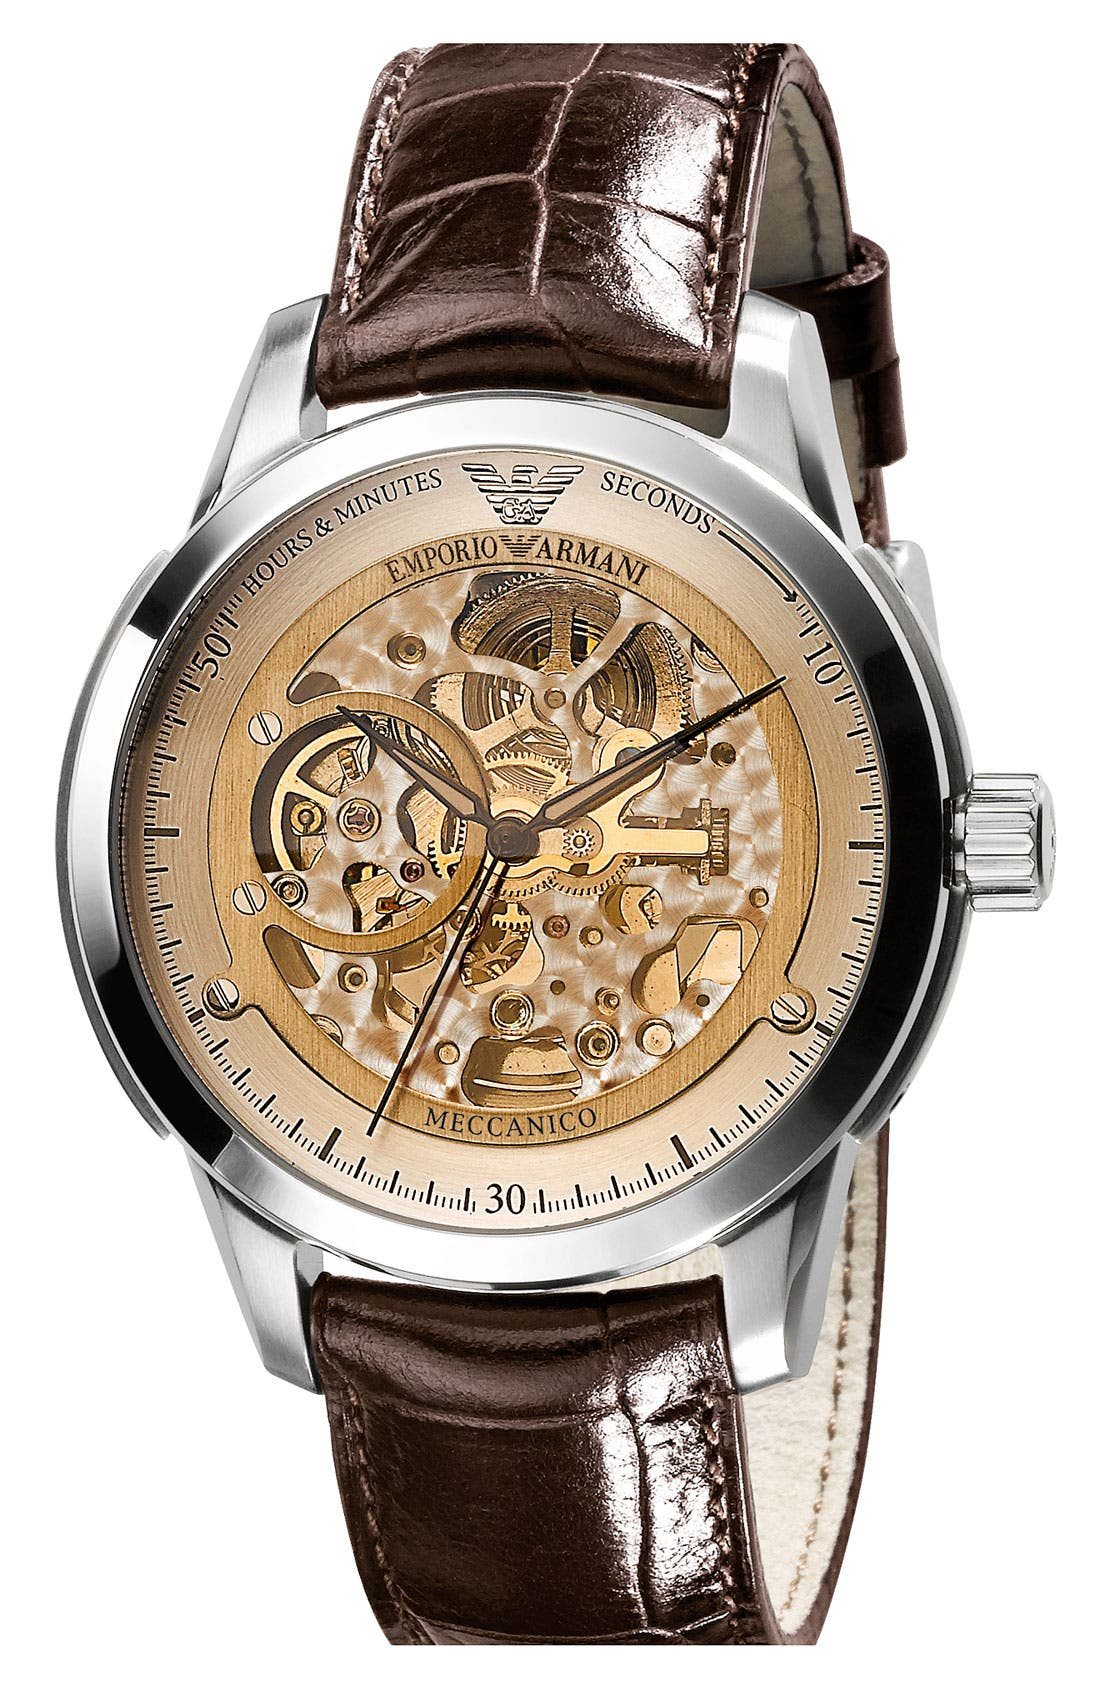 Alternate Image 1 Selected - Emporio Armani 'Meccanico' Automatic Round Watch